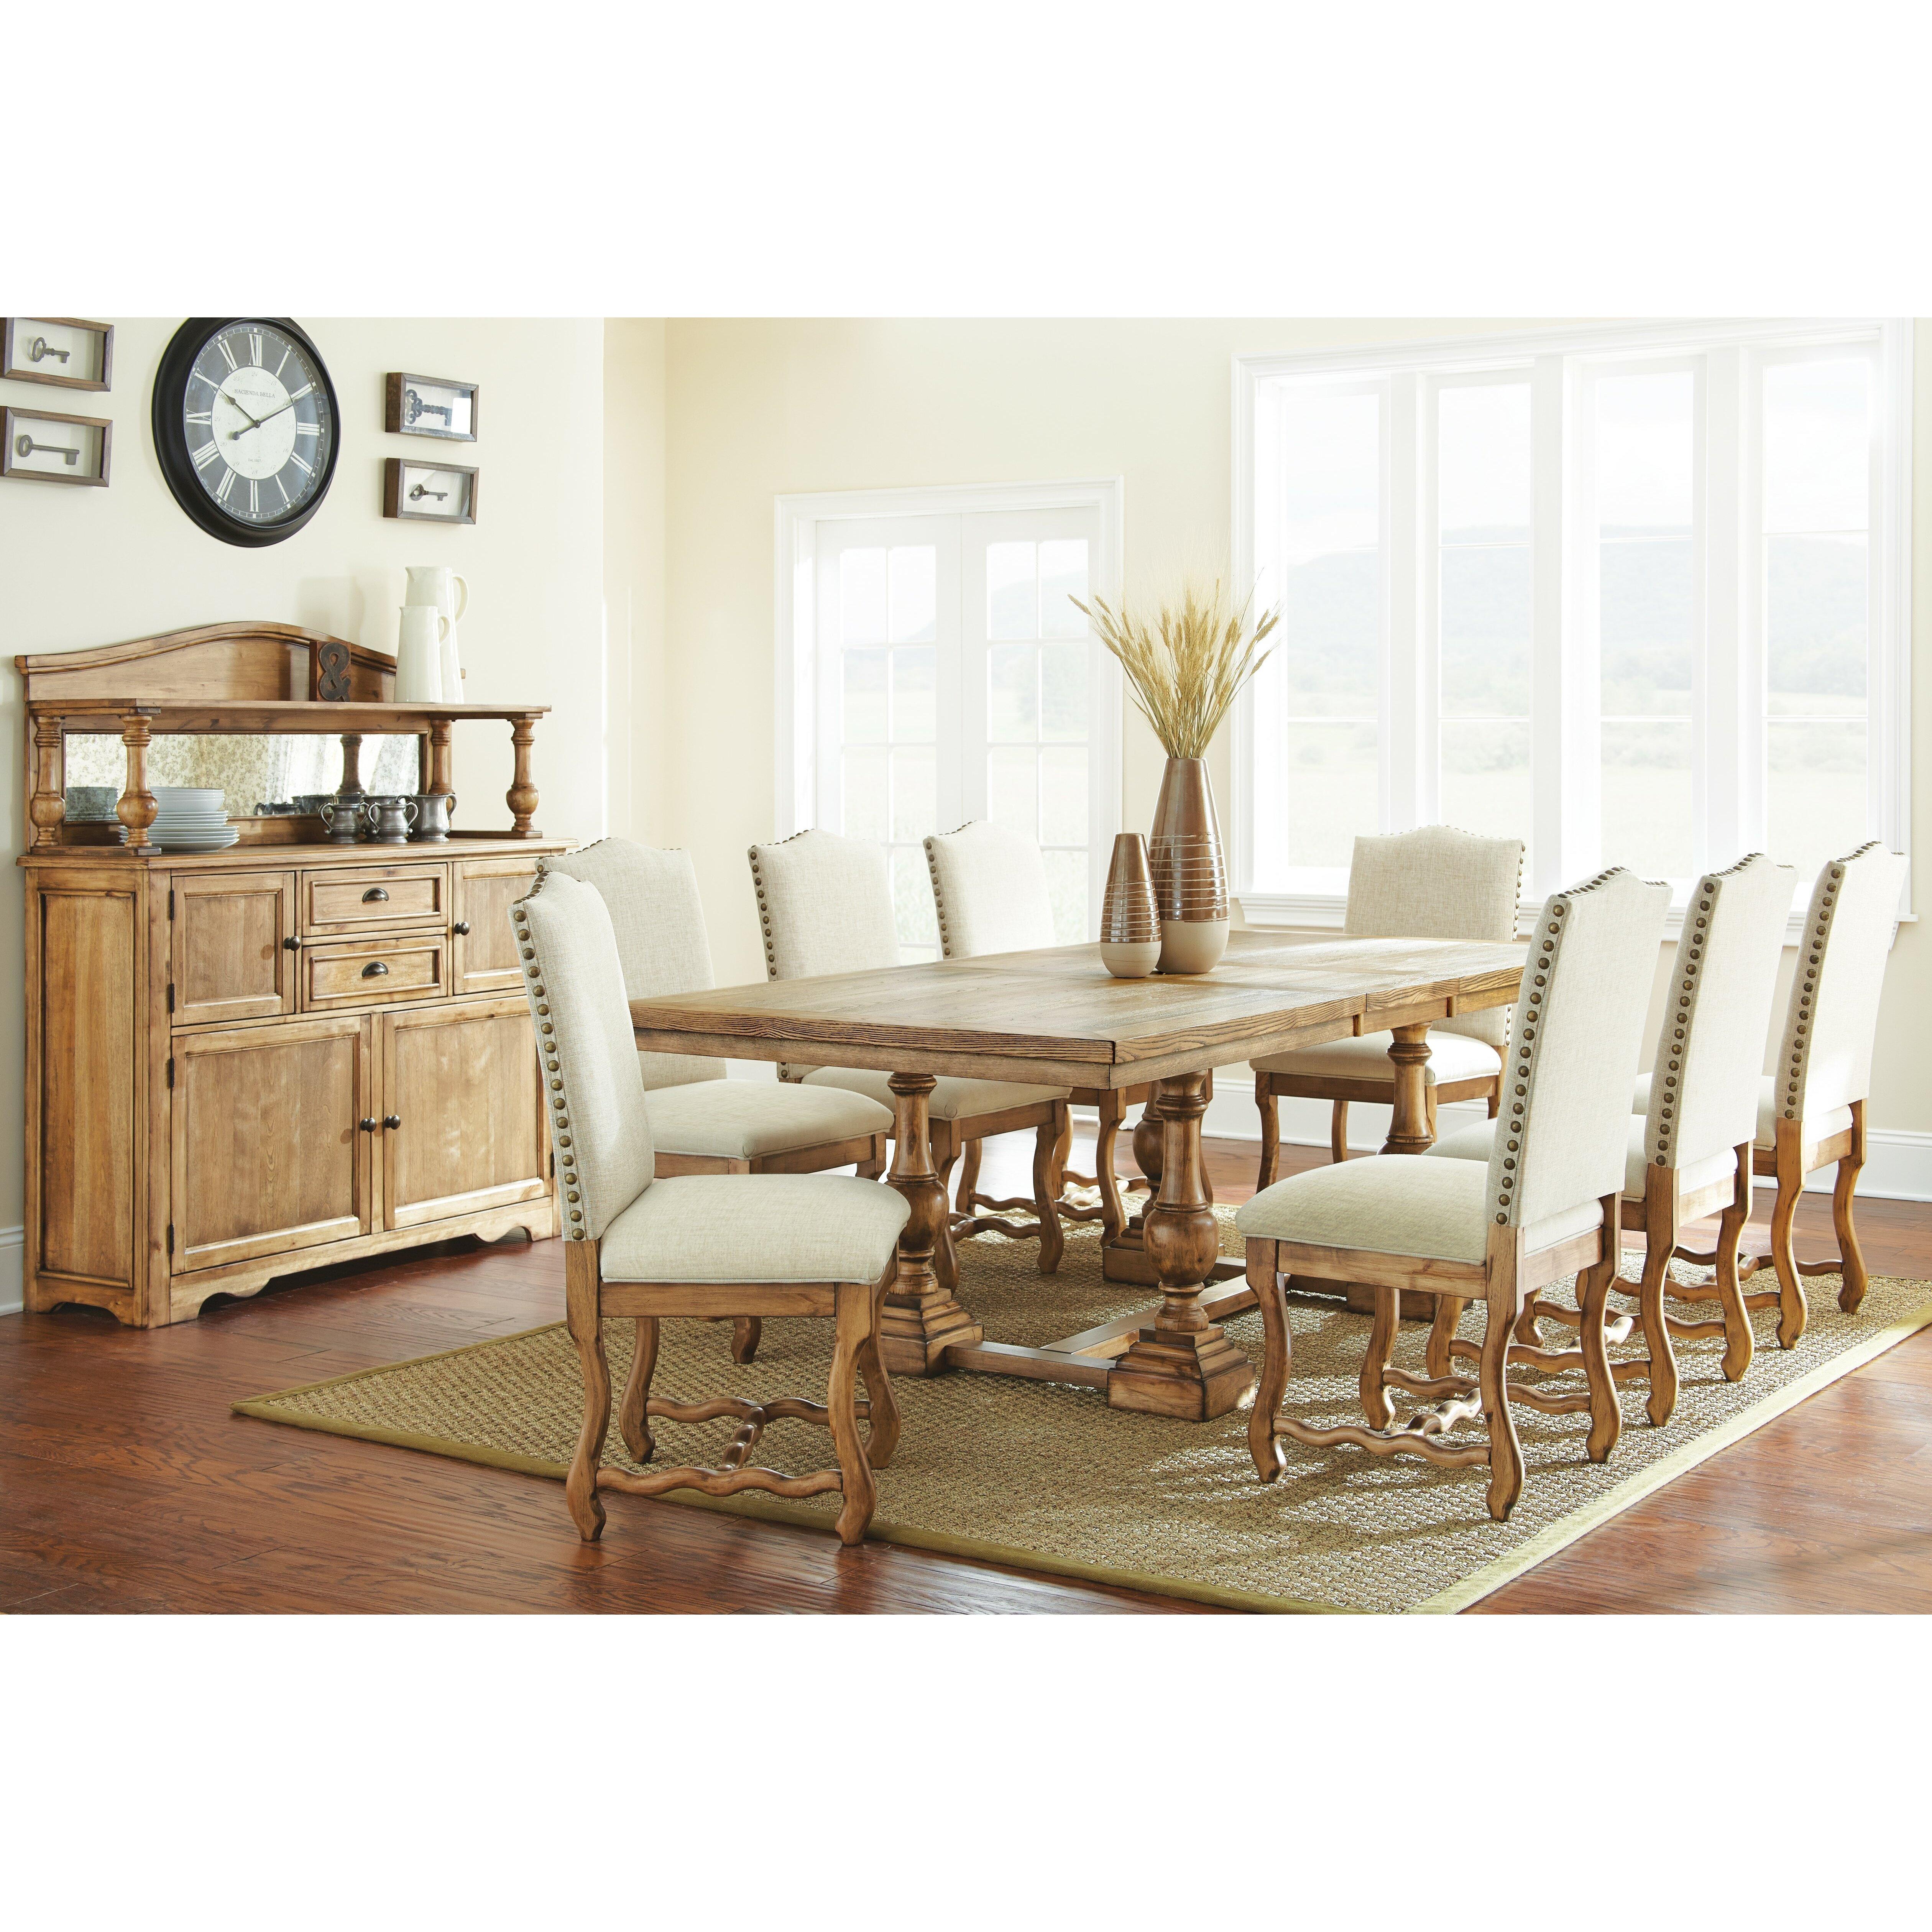 Steve Silver Furniture Plymouth 9 Piece Dining Set Reviews Wayfair